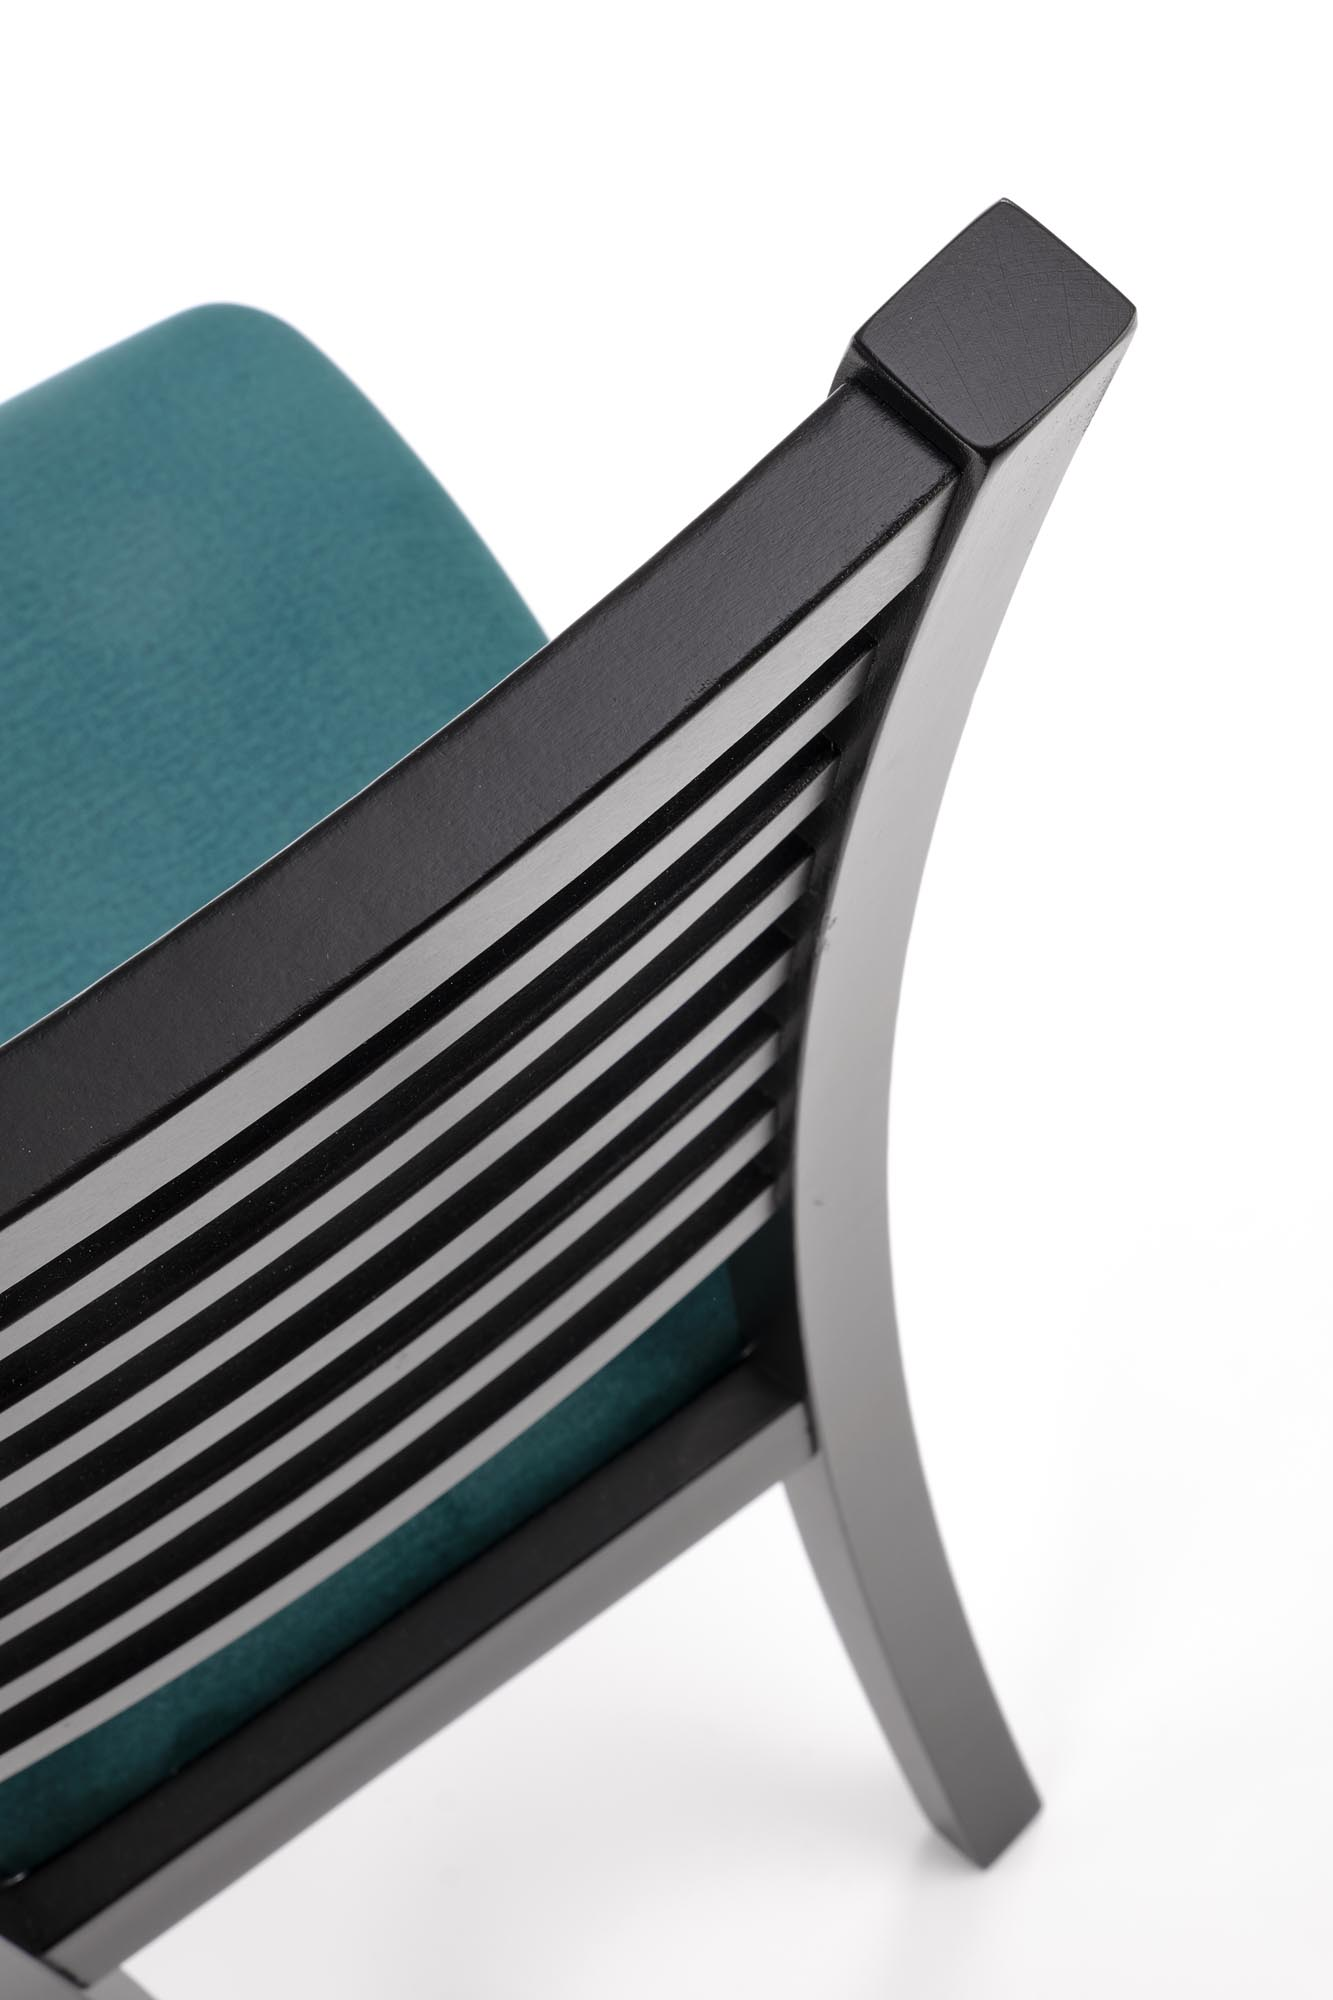 GERARD6 stolička čierna / čal: velvet Monolith 37 (tmavo zelená)